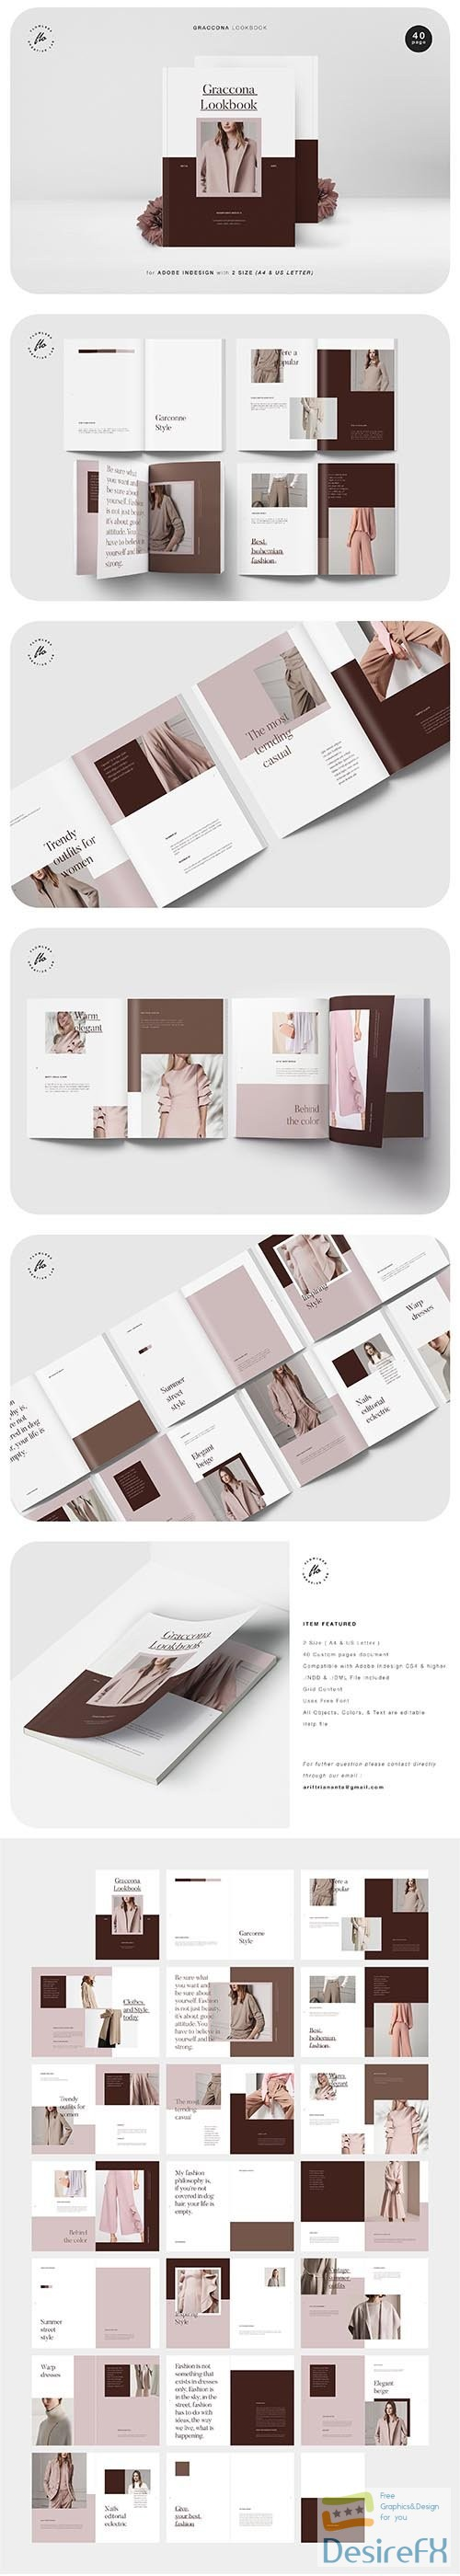 other - CreativeMarket - GRACCONA Lookbook 3611408